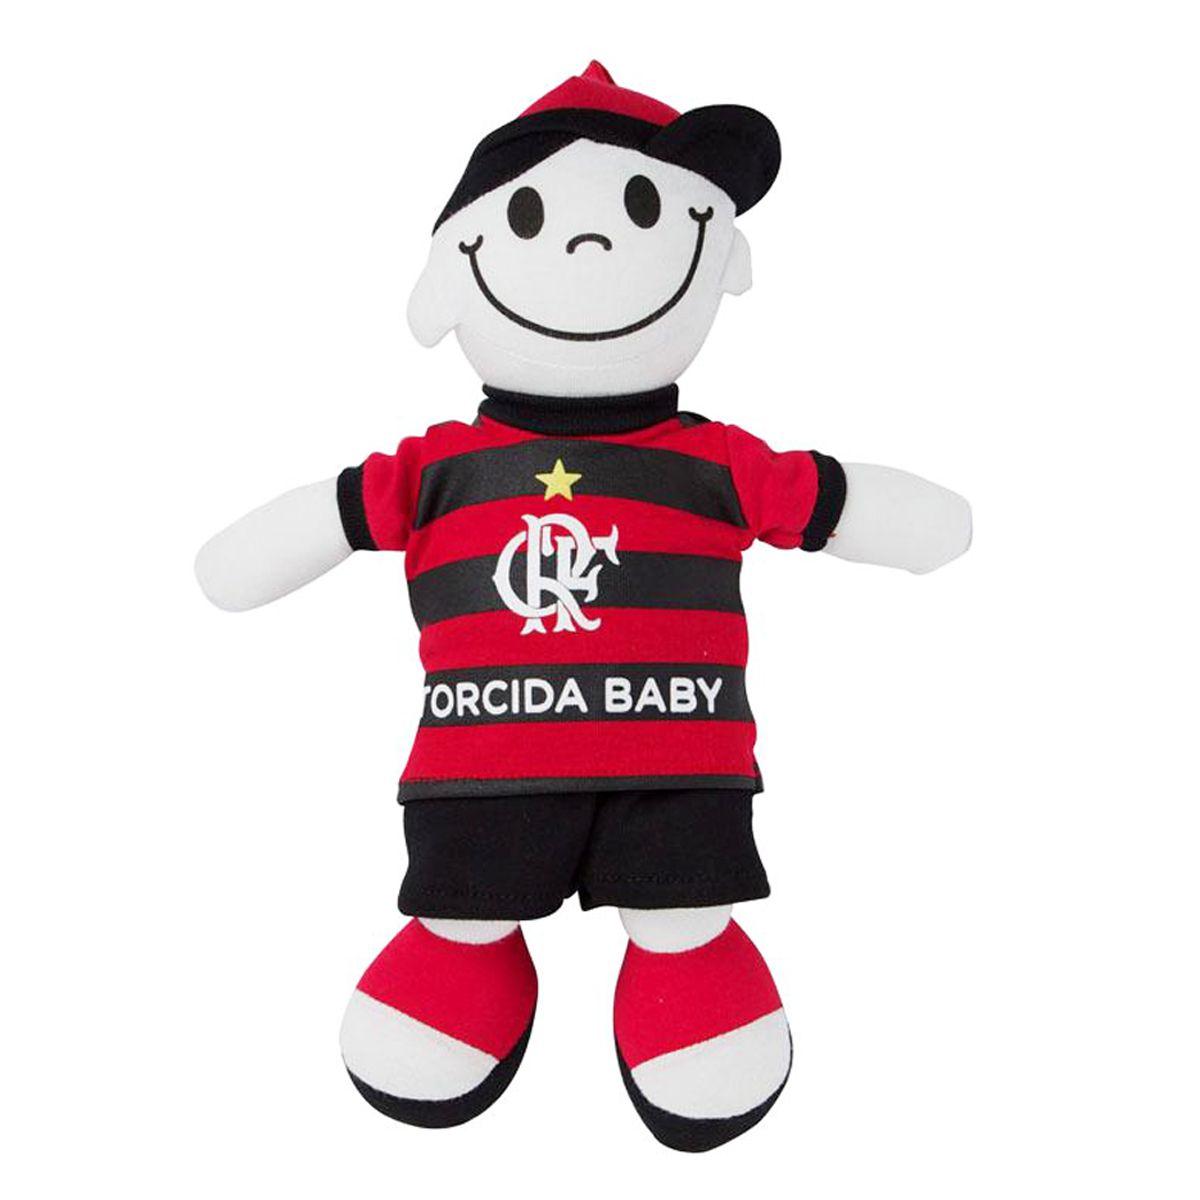 Boneco Mascote do Flamengo - Torcida Baby 238A